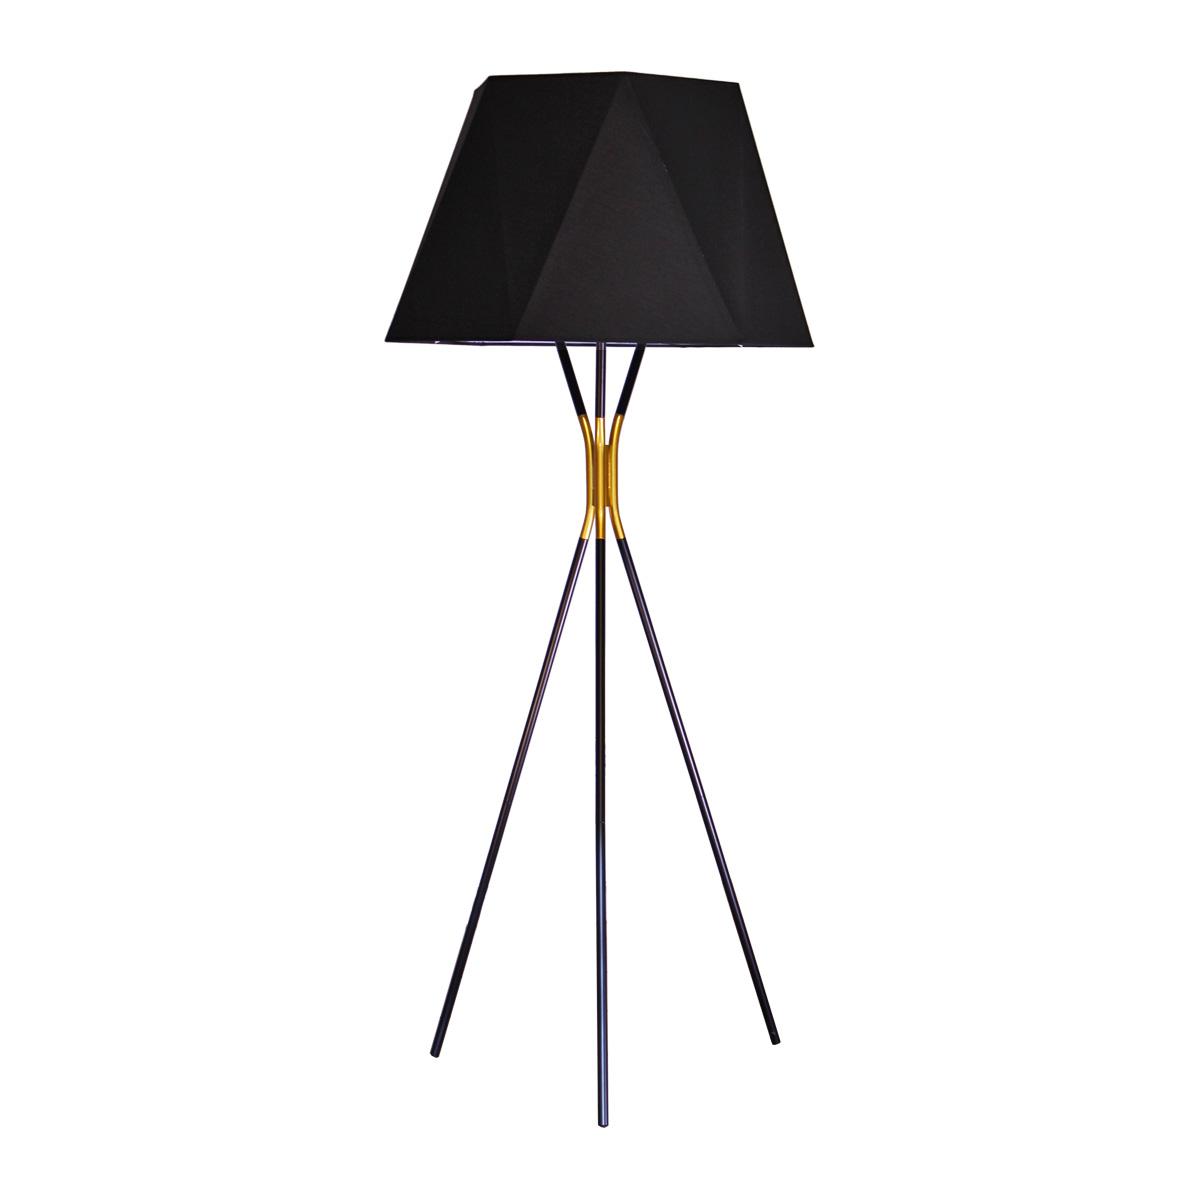 Podna lampa 1.0121 crno-zlatna